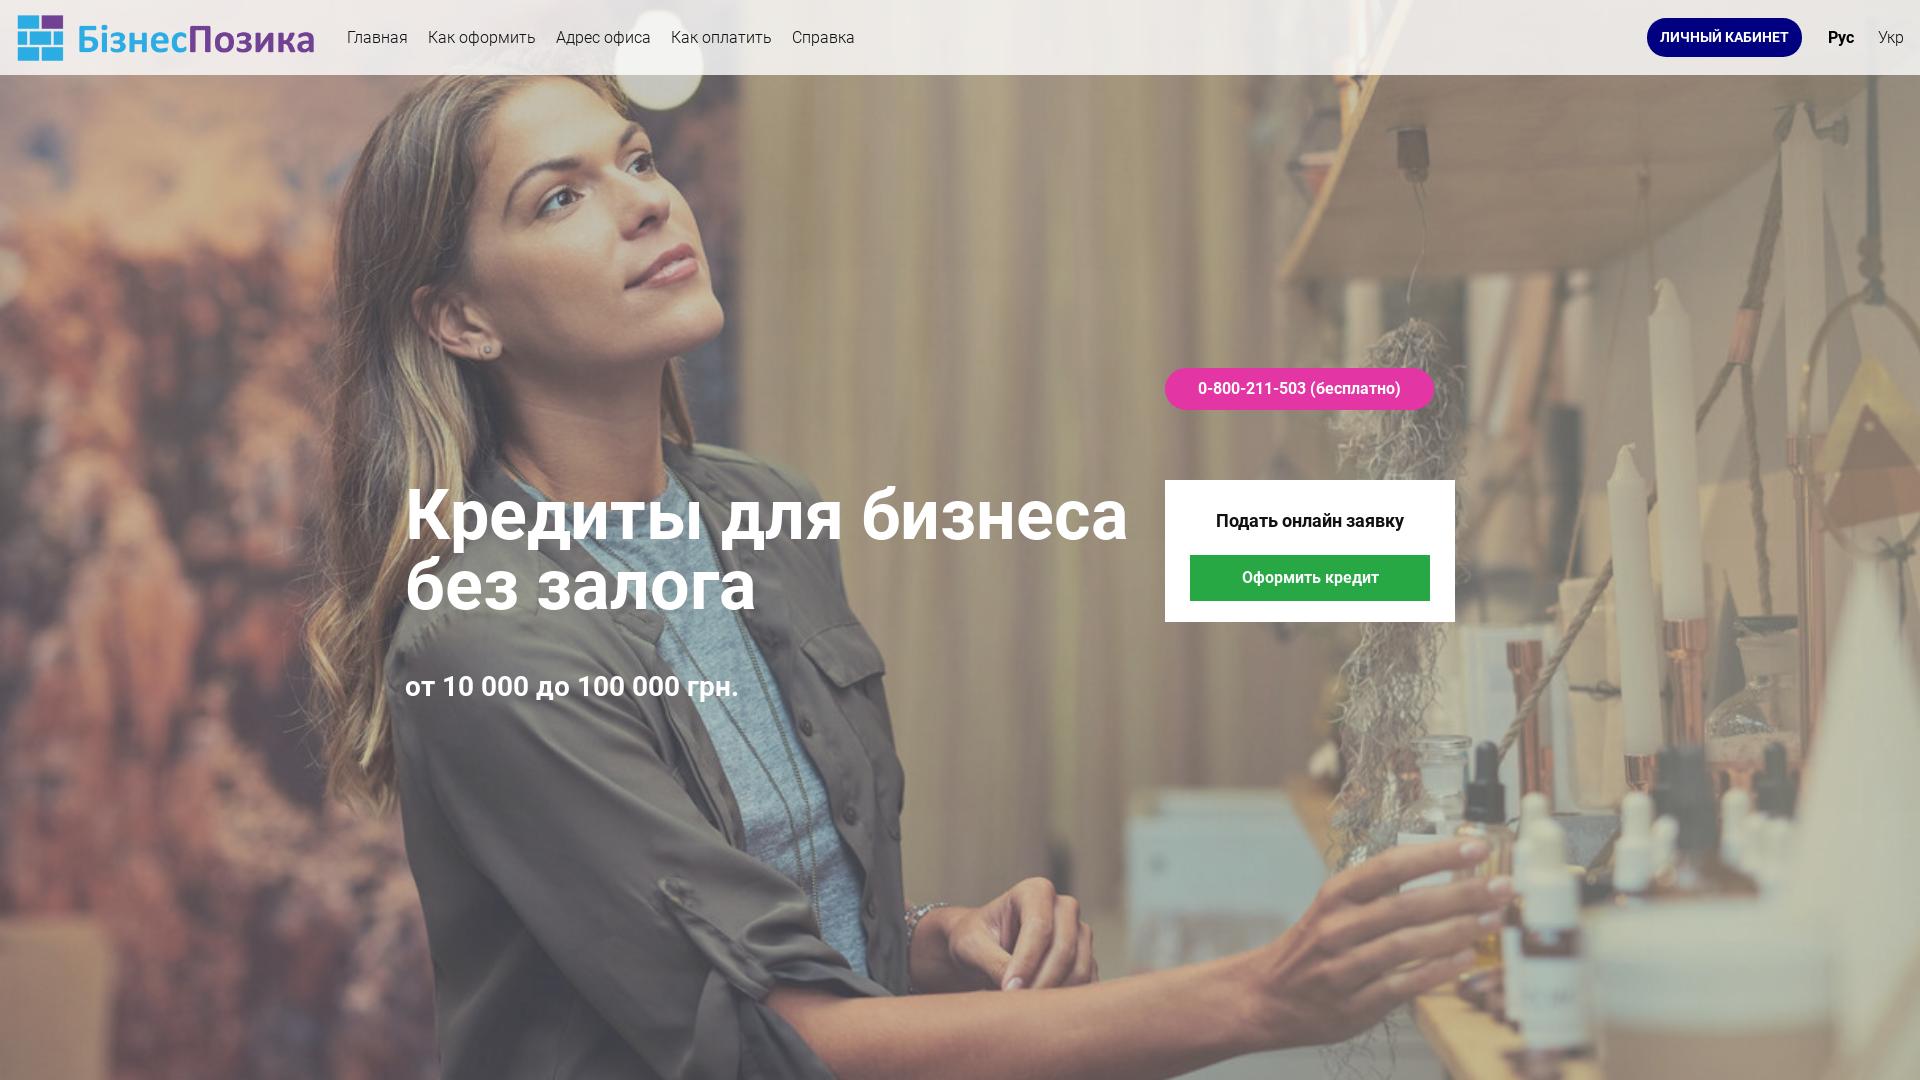 БизнесПозыка [CPL, API] UA website